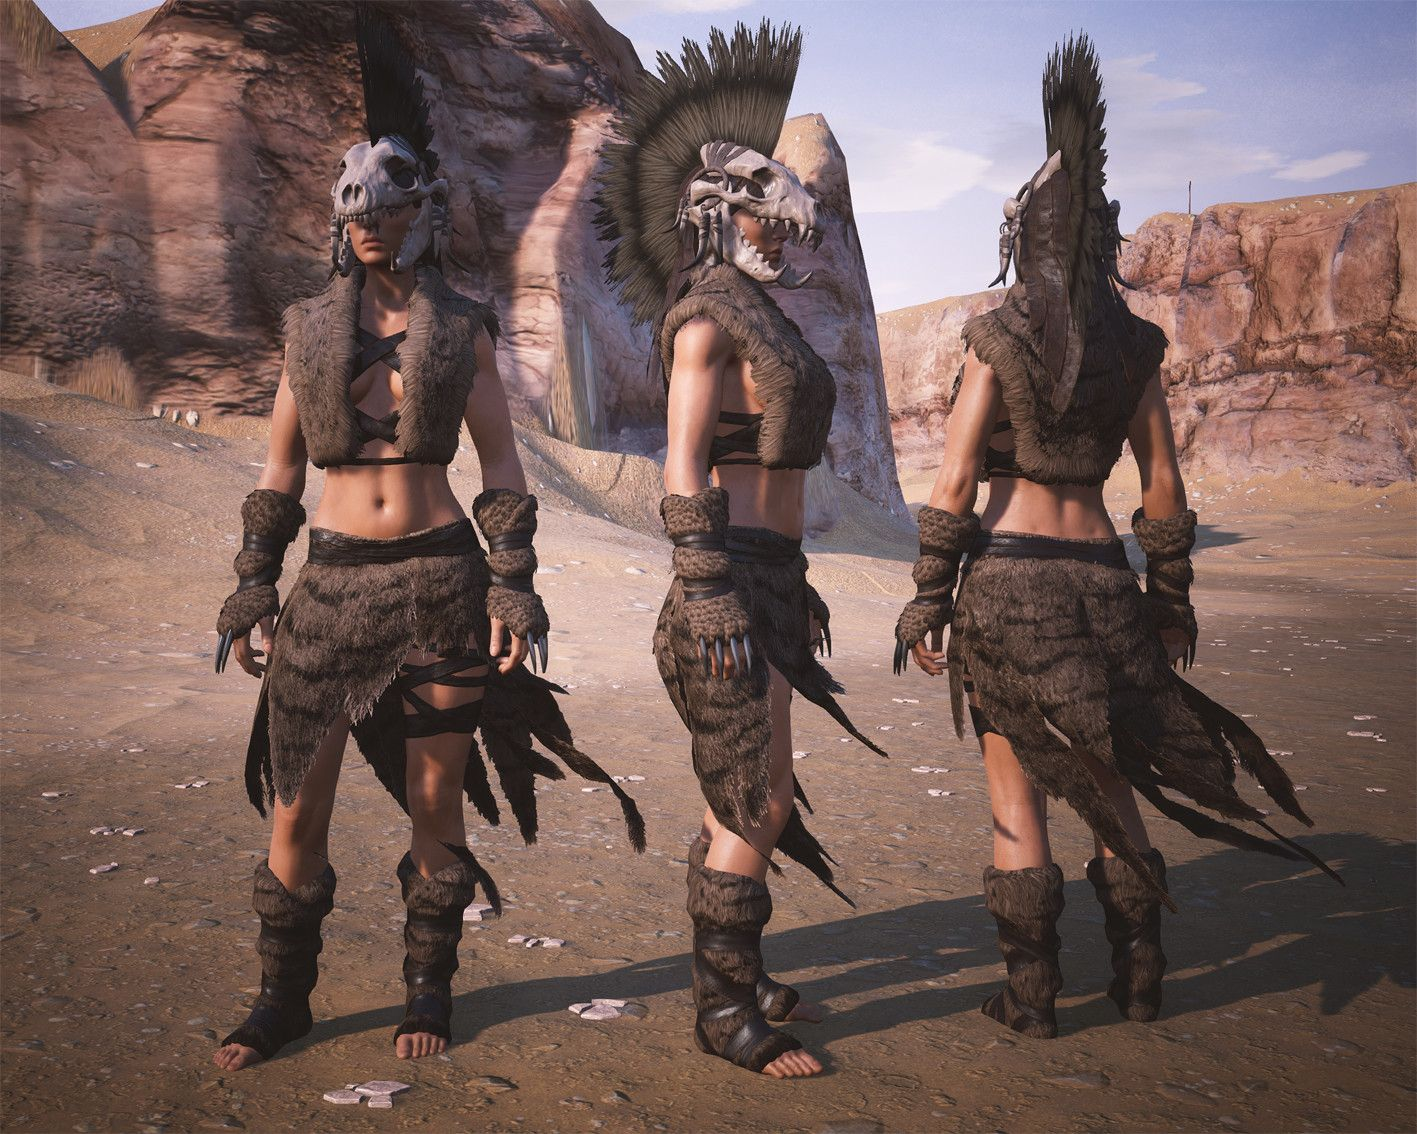 ArtStation - Conan Exiles - Hyena fur armor, Jenni